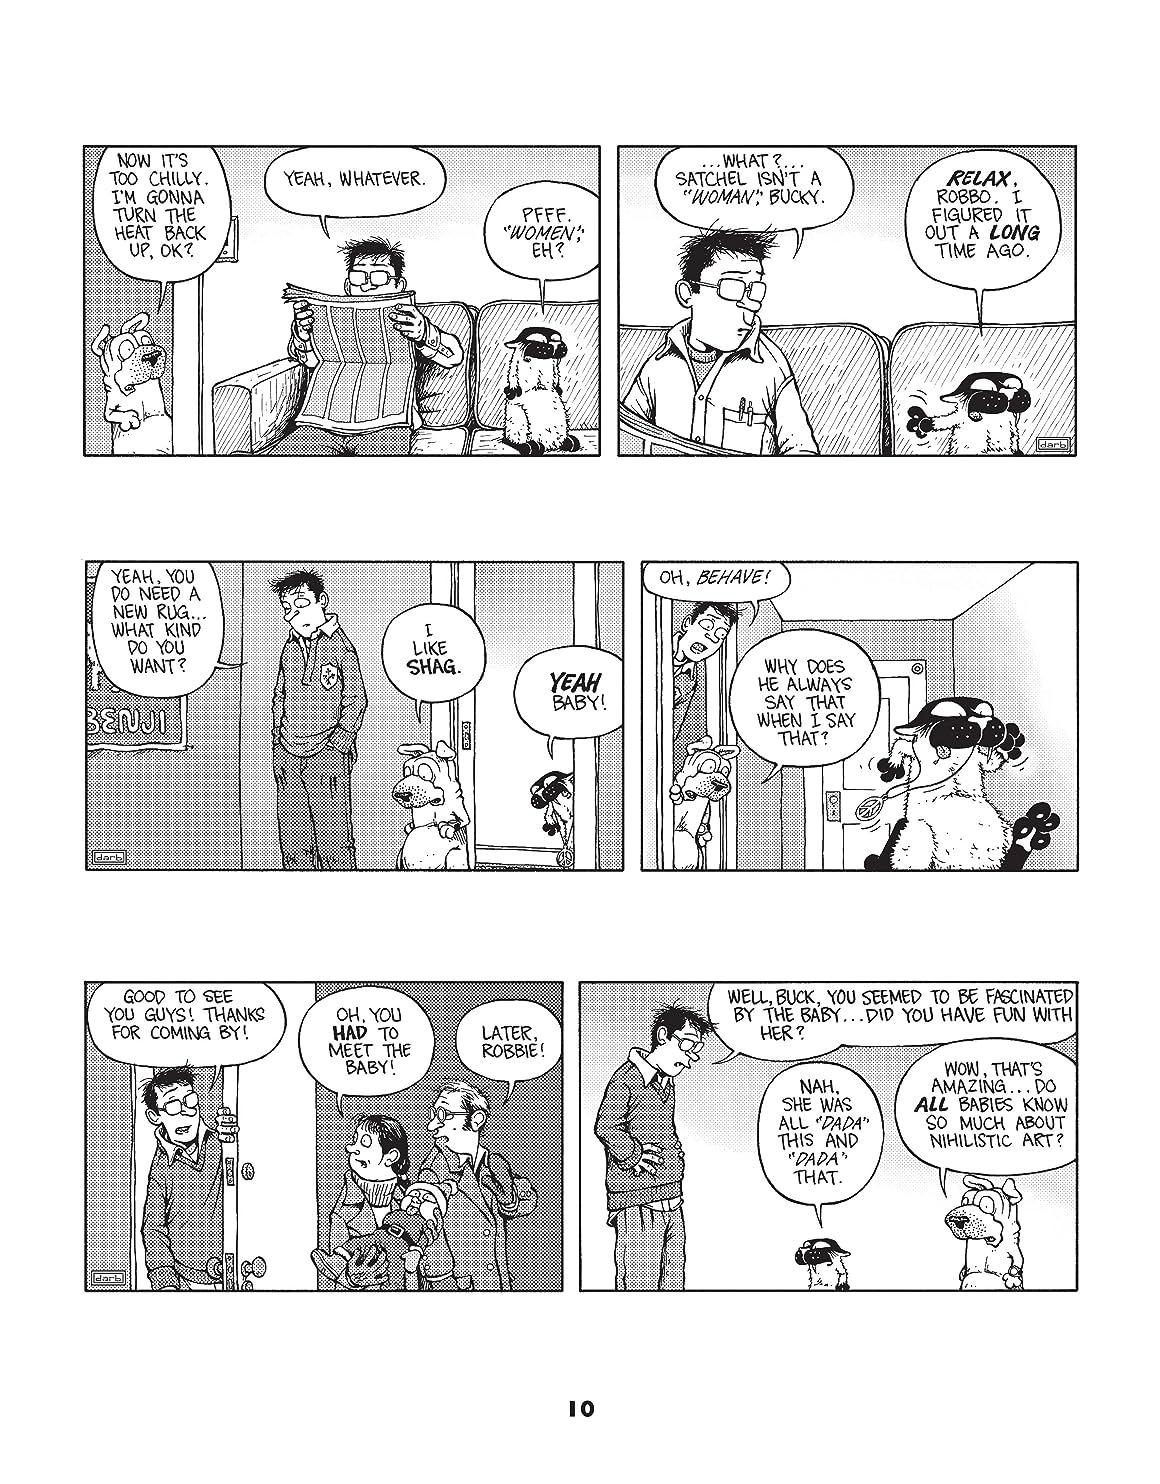 Bucky Katt's Big Book of Fun: Get Fuzzy